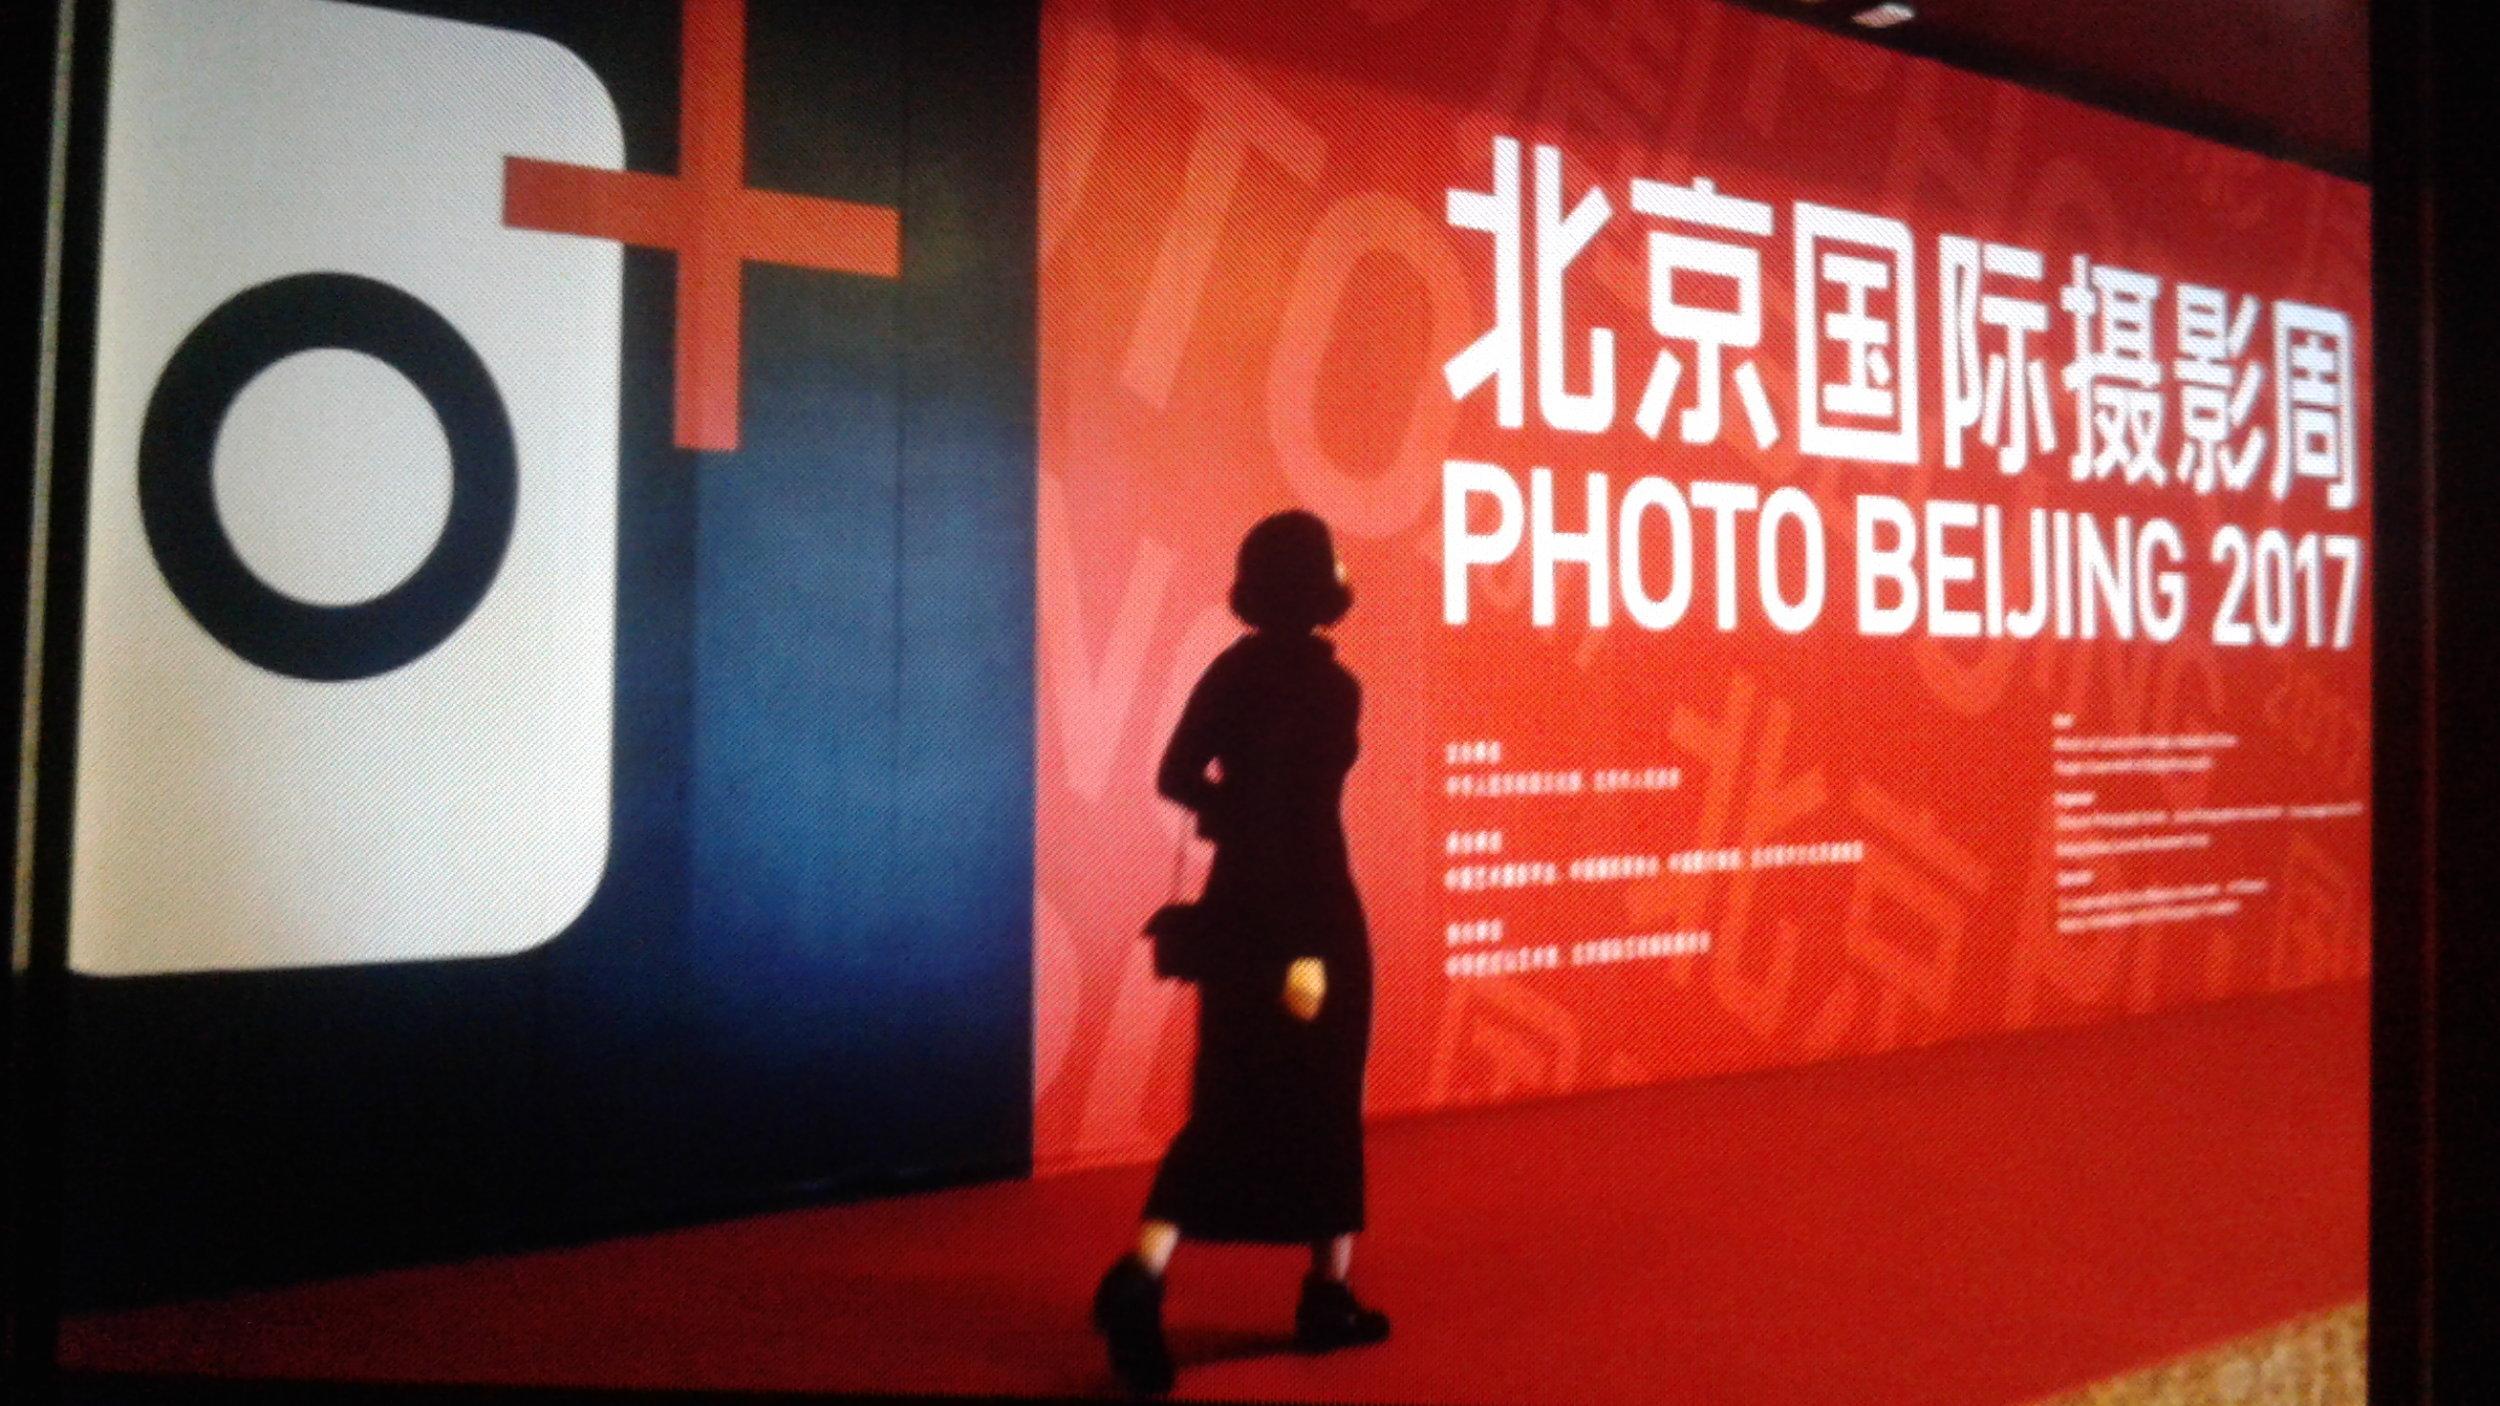 Kitty Paranaguá expõe na China, durante o Festival Photo Beijing 2017